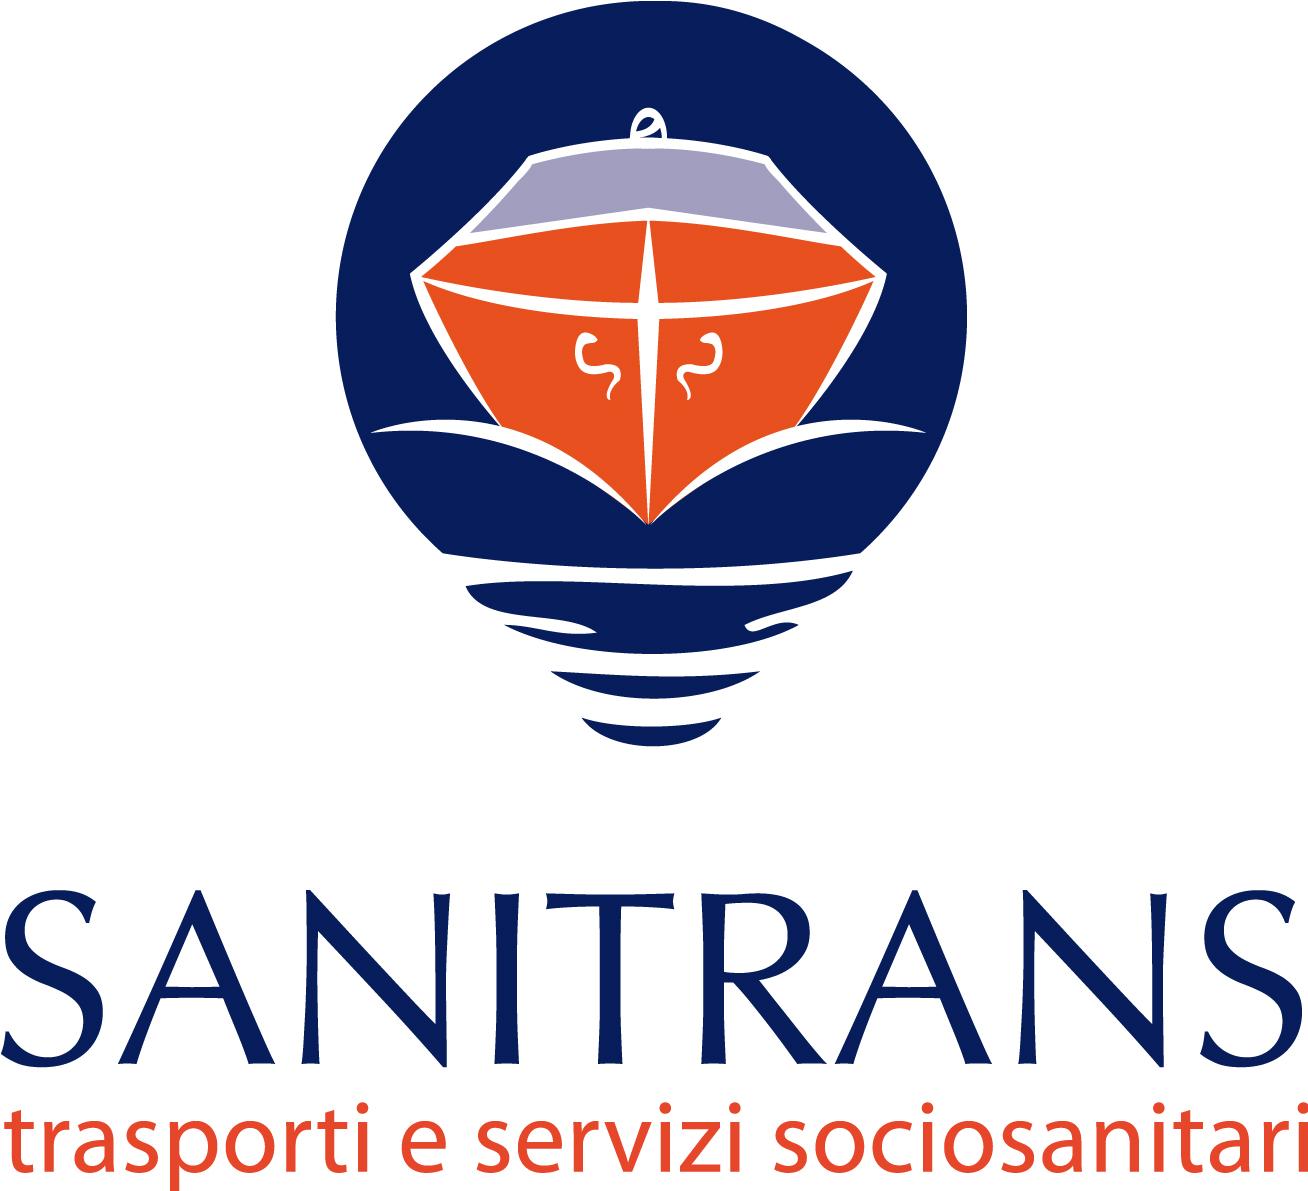 SANITRANS S.P. S.r.l.